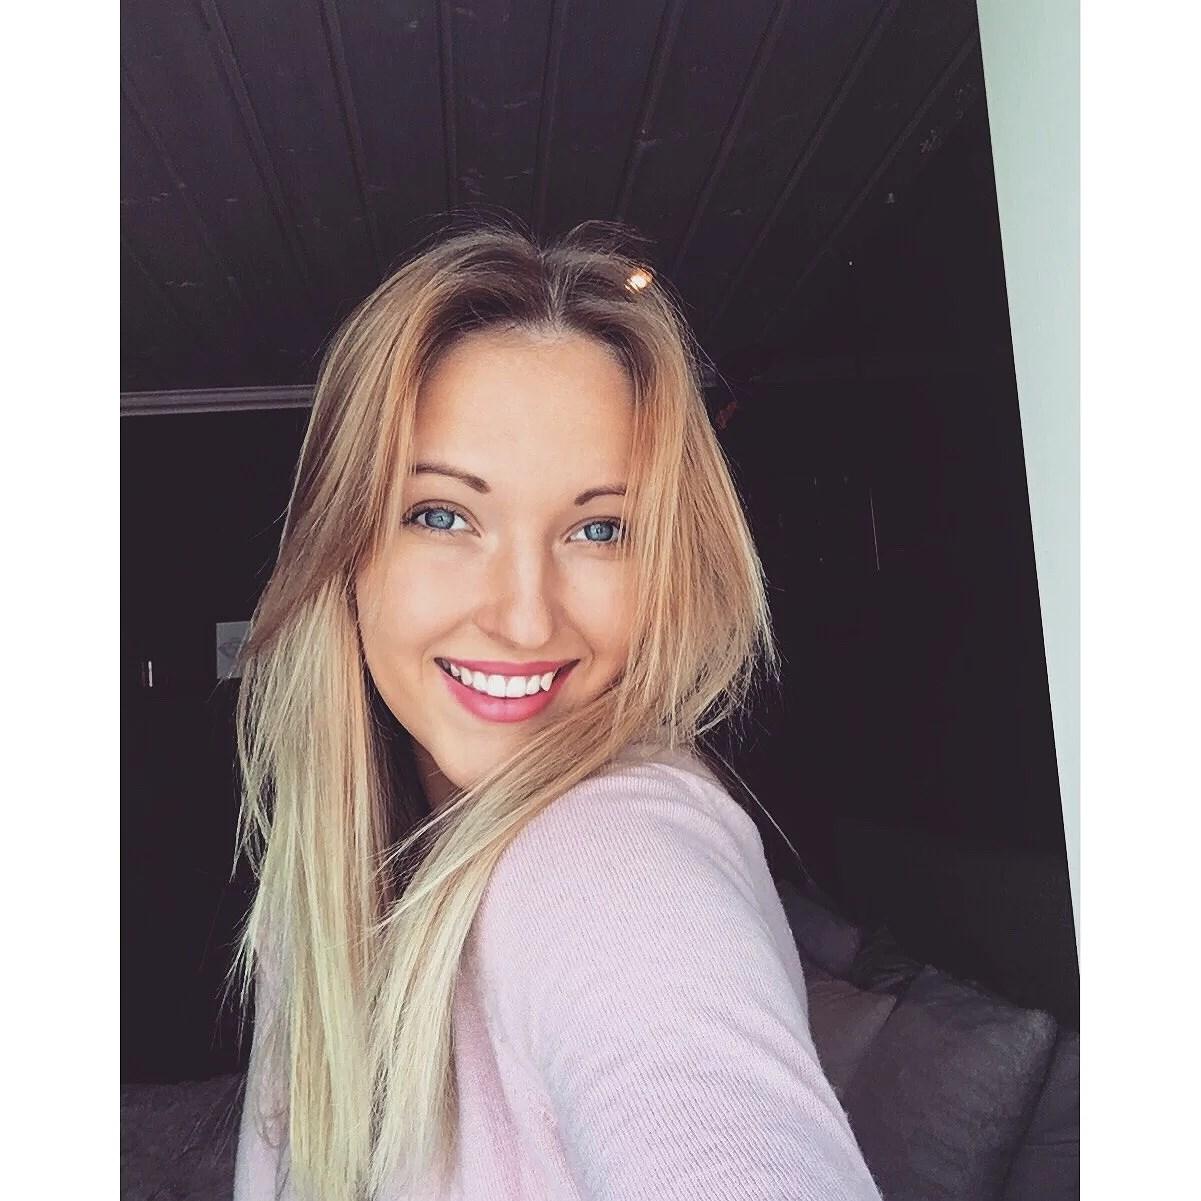 Saturday smile baby